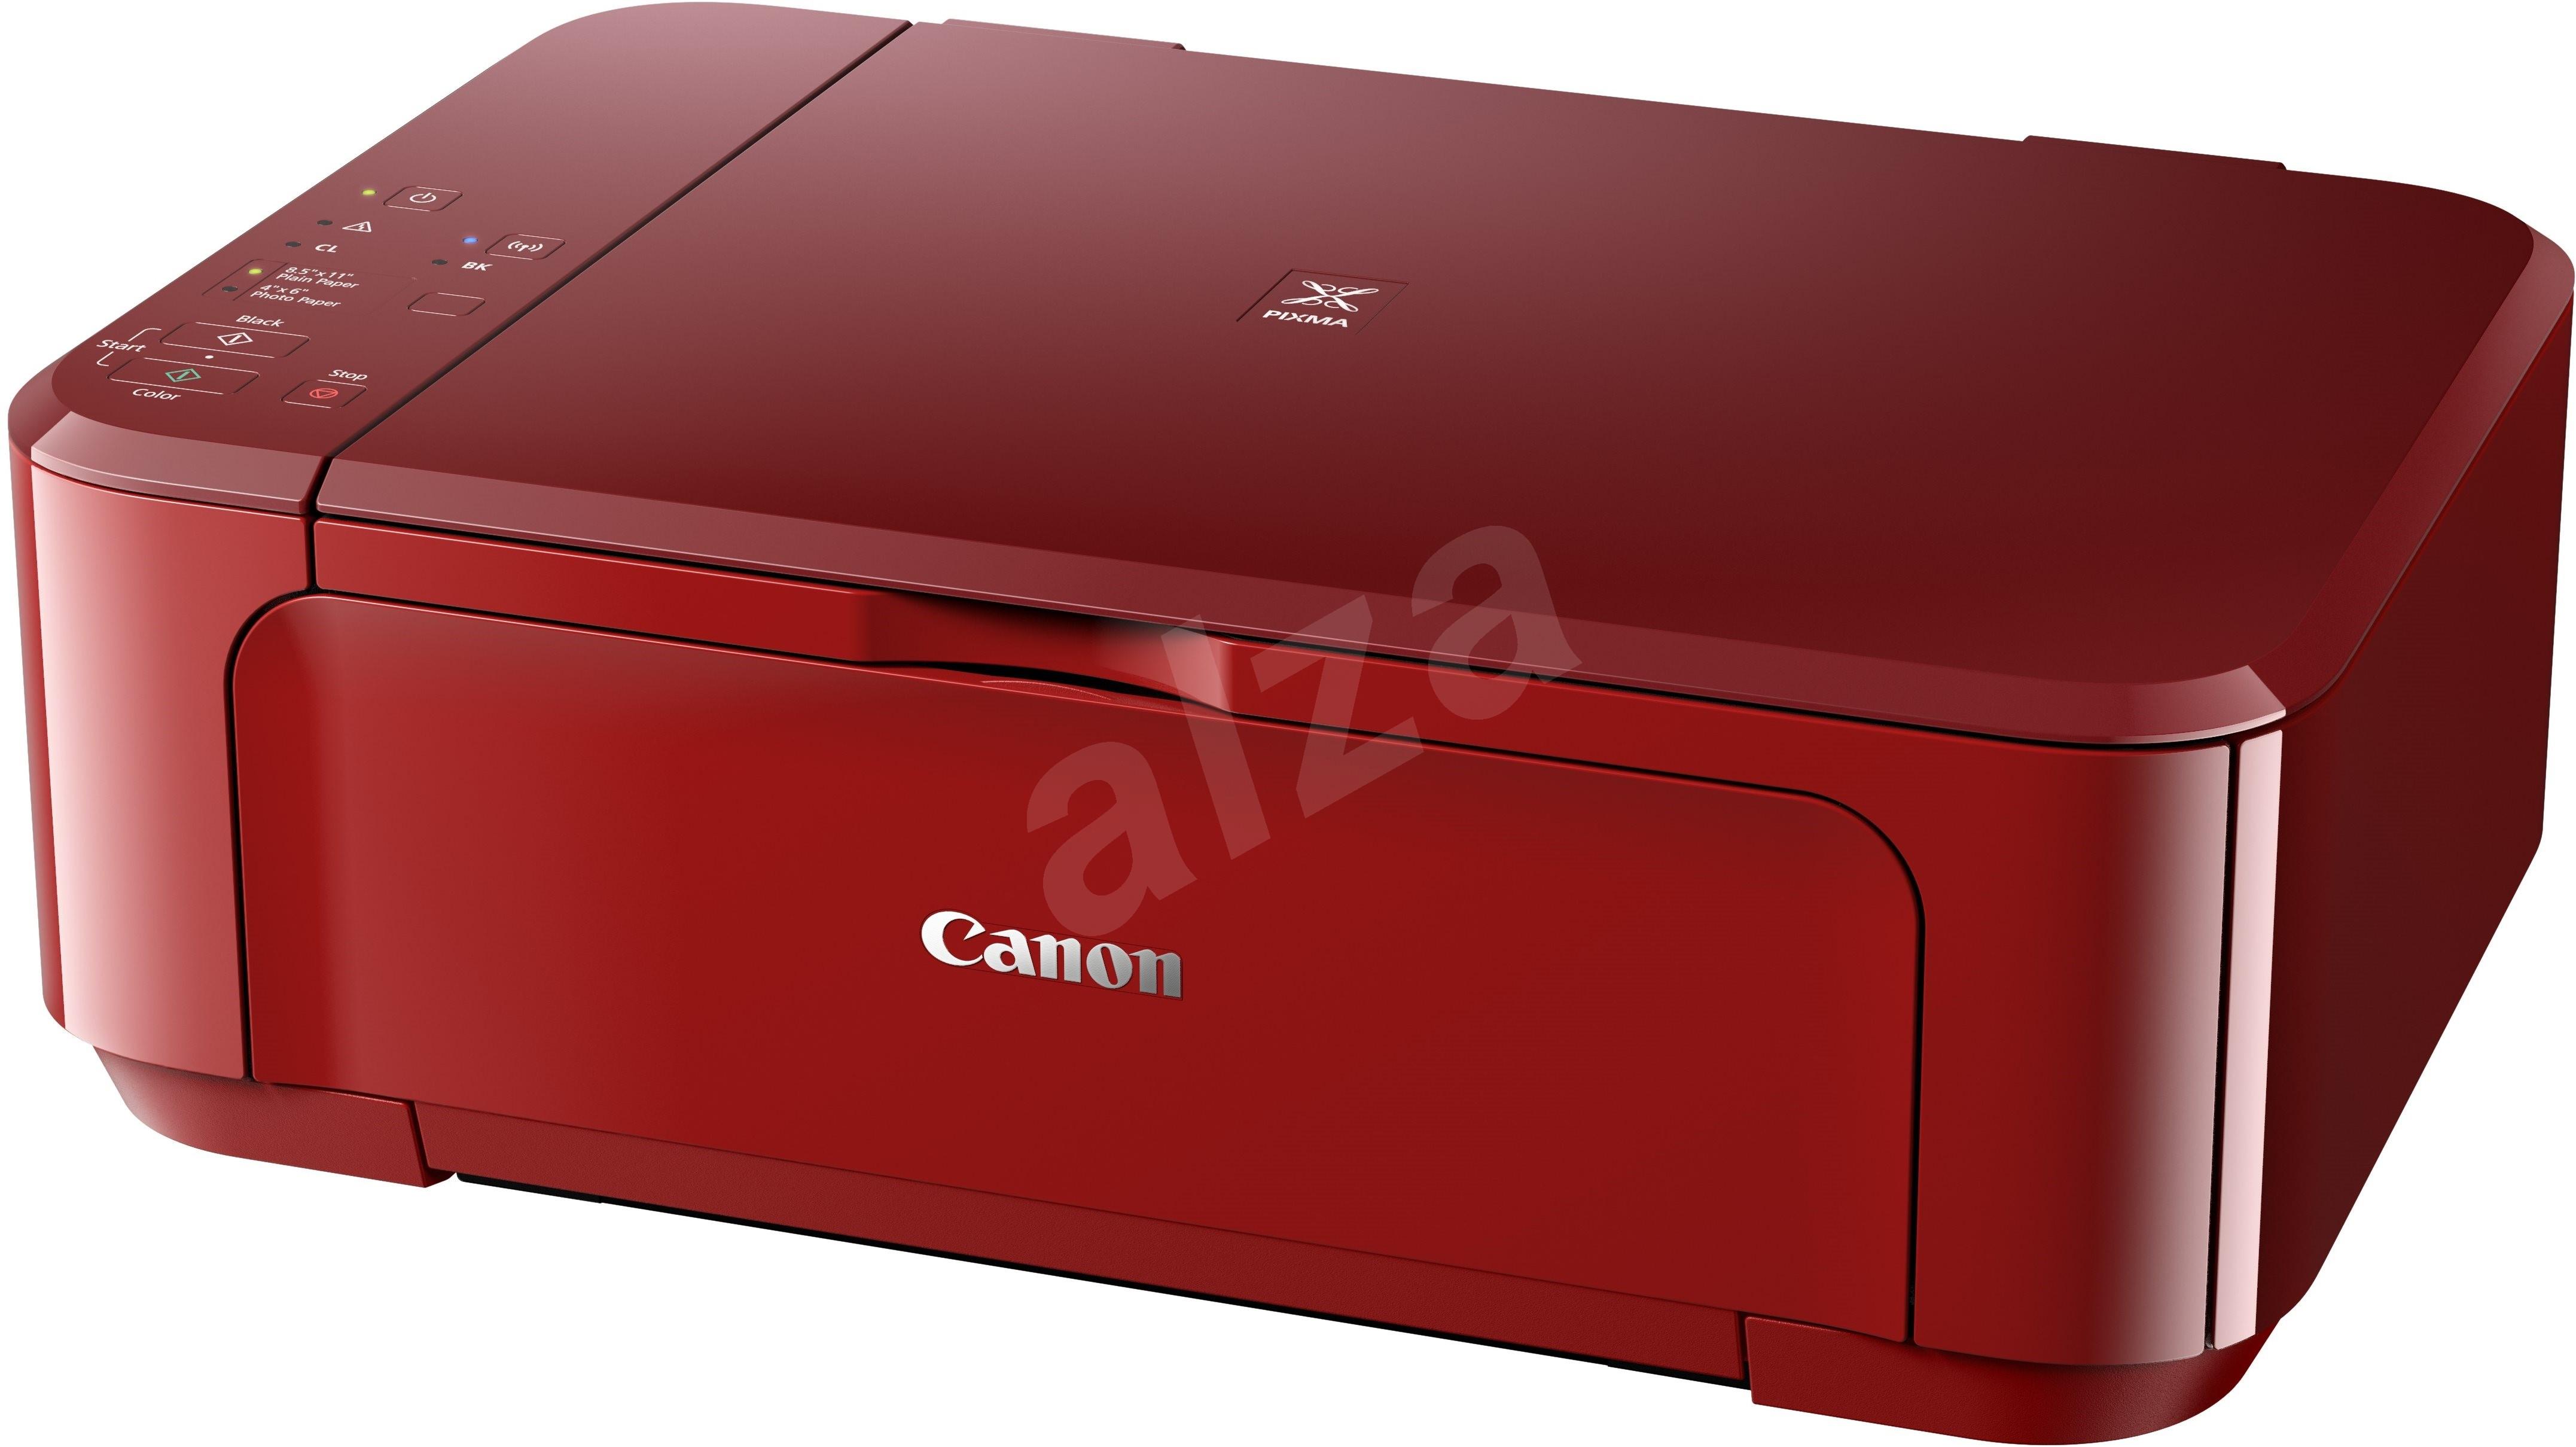 canon pixma mg3650 red inkjet printer. Black Bedroom Furniture Sets. Home Design Ideas